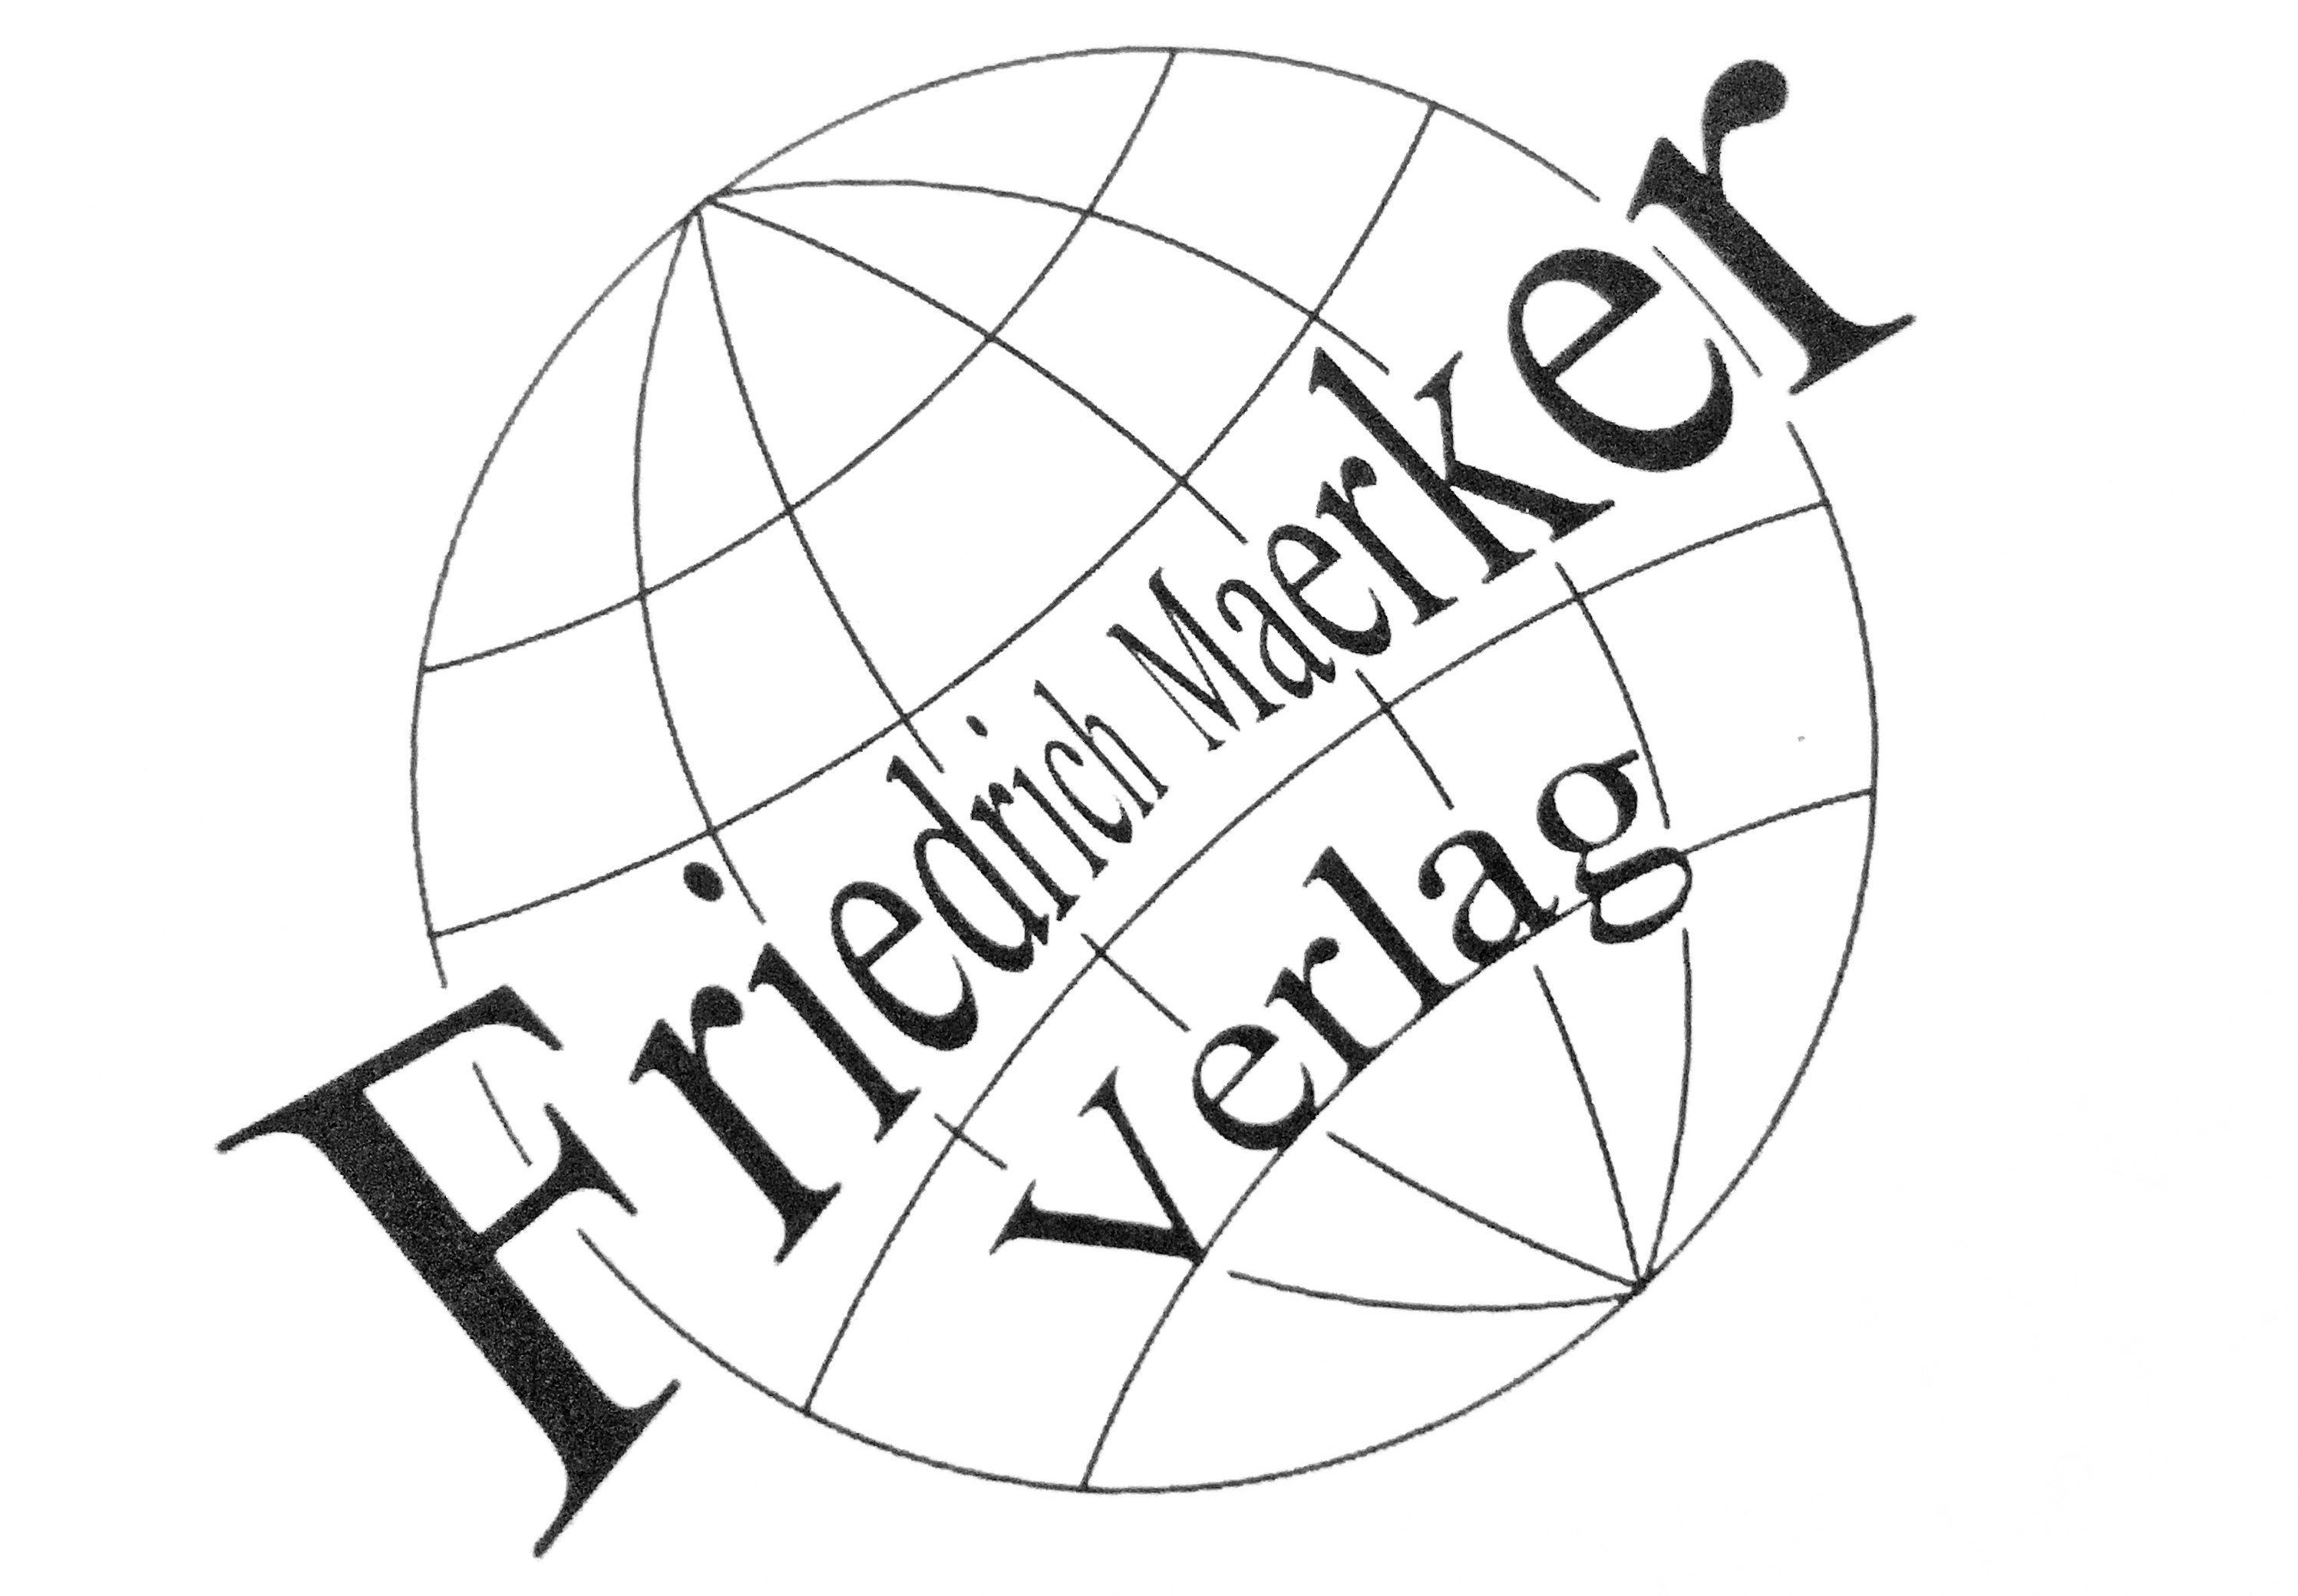 Friedrich-Maerker-Verlag